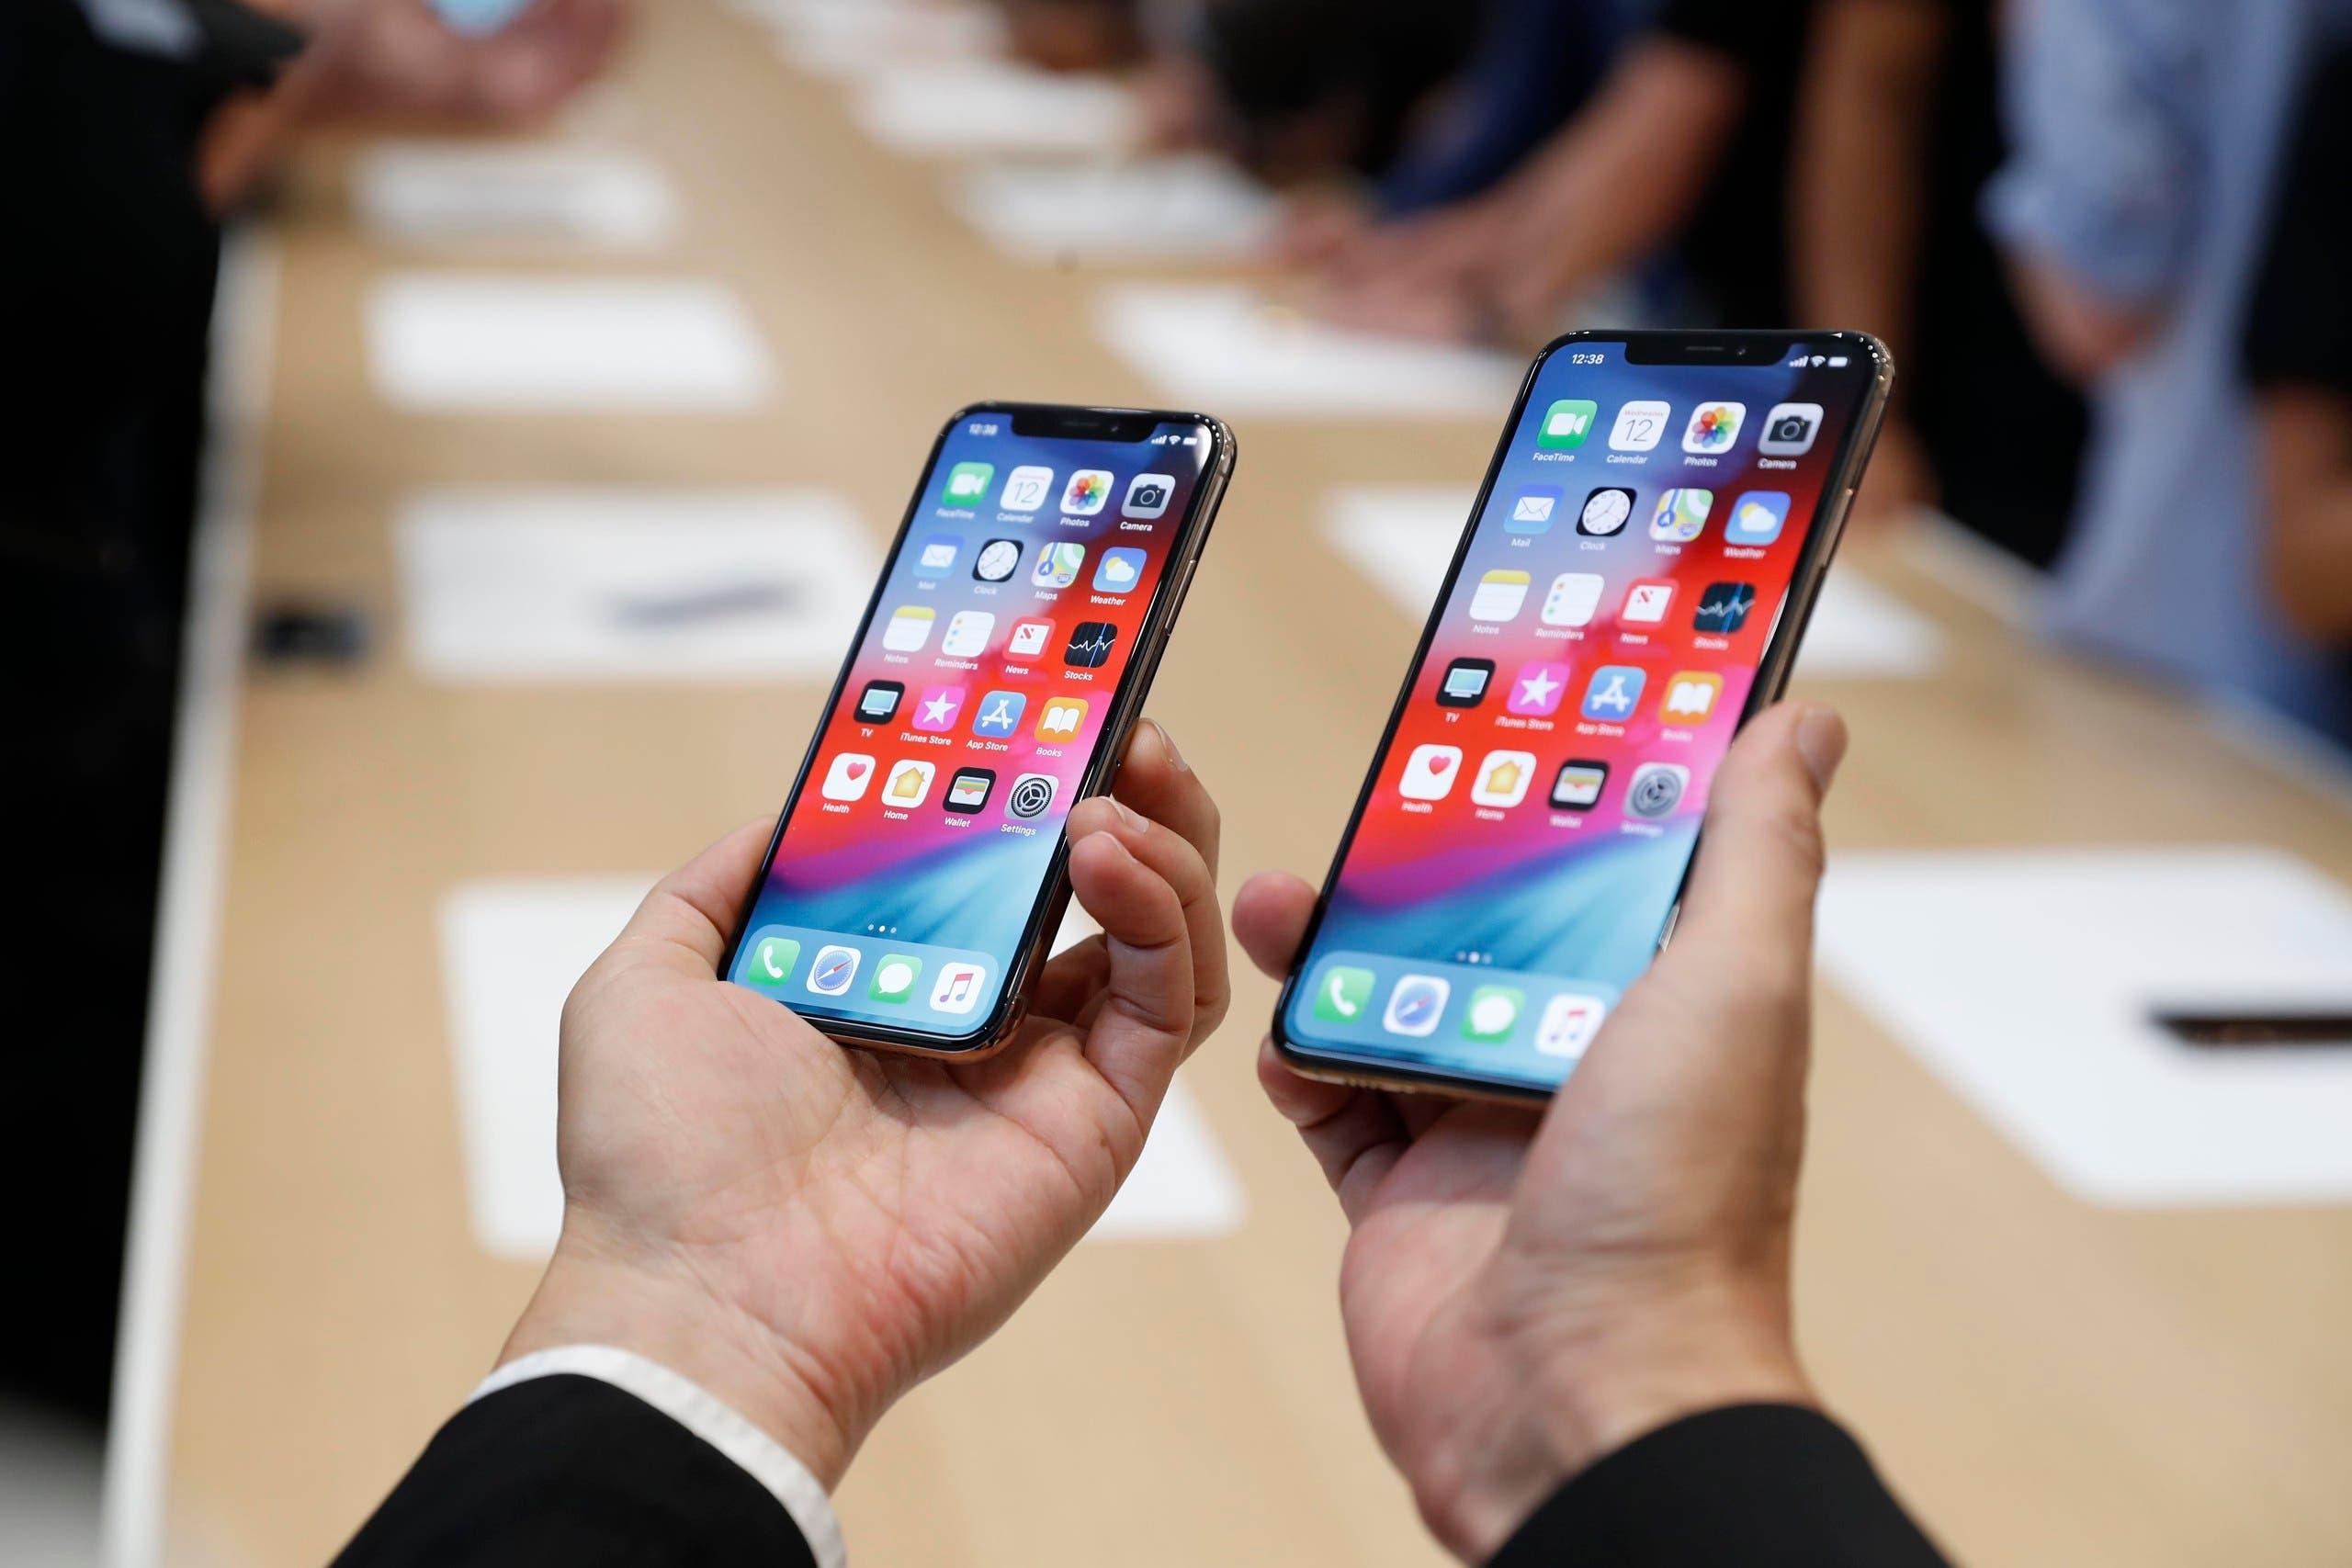 %name سعر ومواصفات هواتف ايفون الجديدة،XSg ,Xmaxg ,Xr